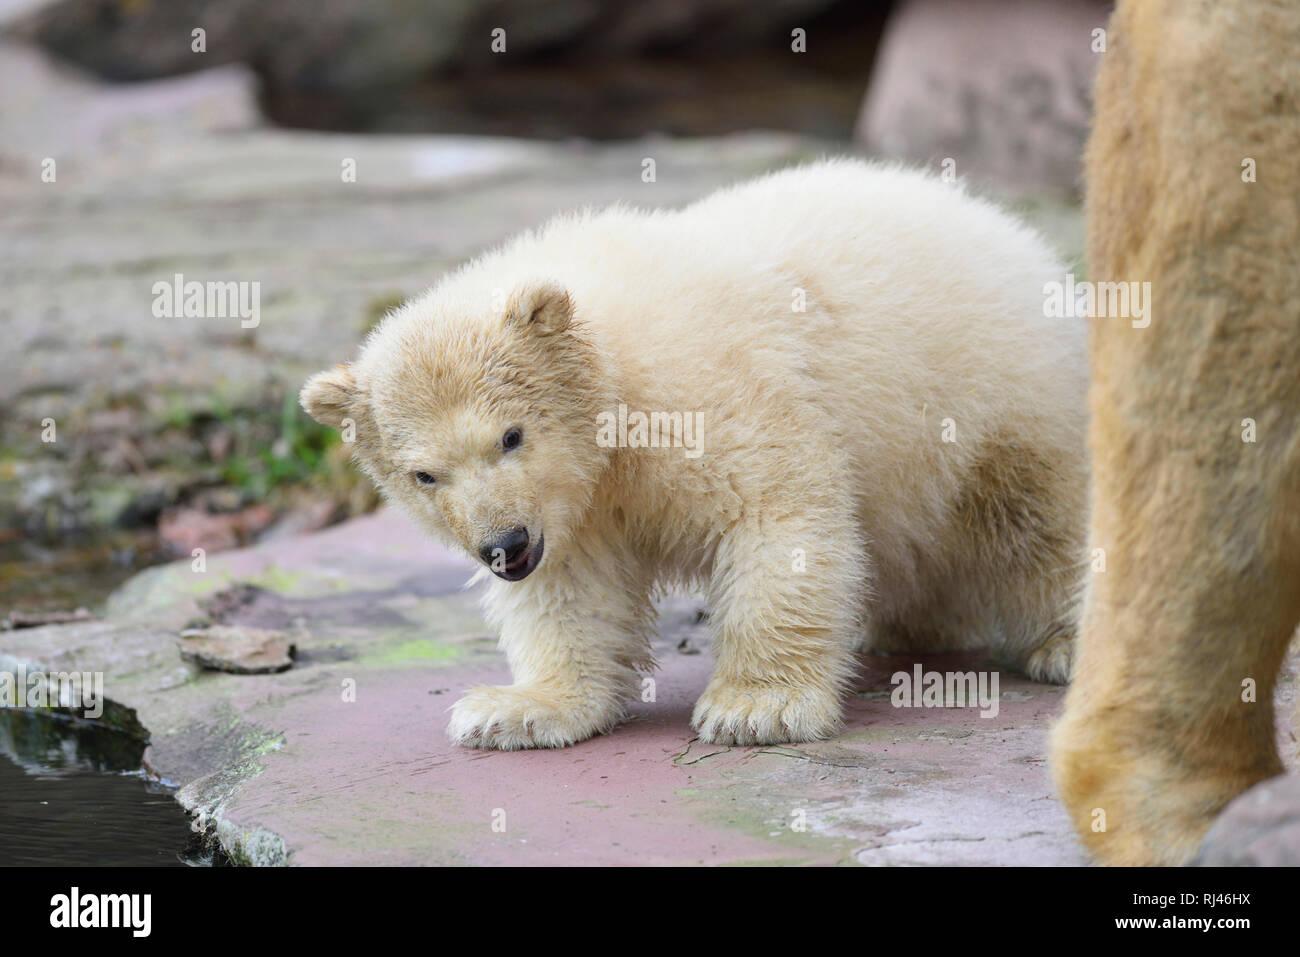 Eisb?r, Ursus maritimus, Jungtier, Felsen, frontal, stehen - Stock Image